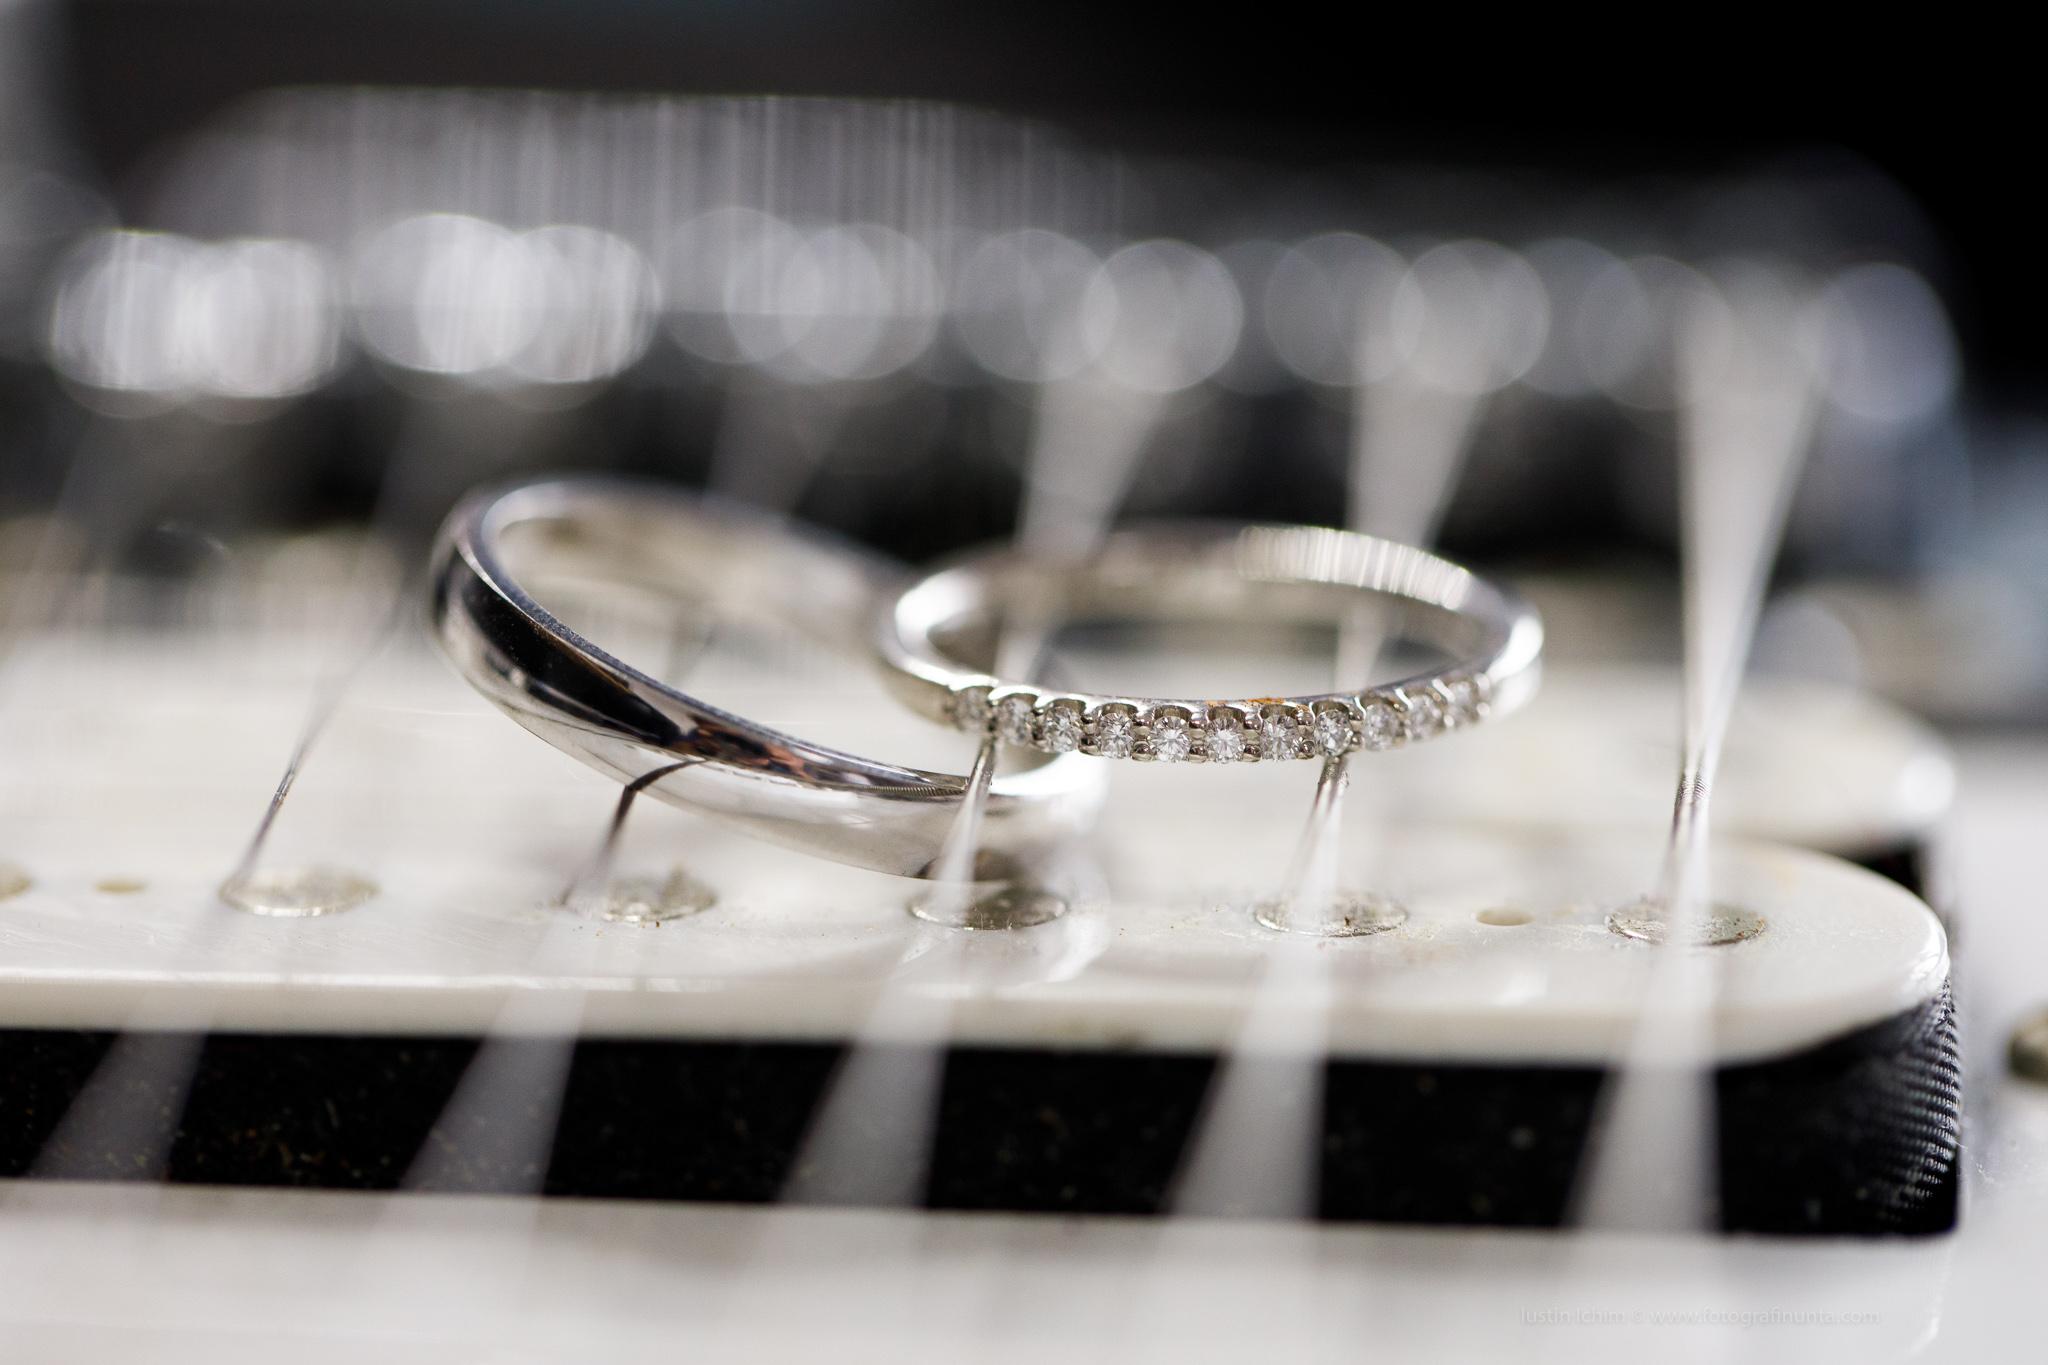 Detalii nunta, verighete